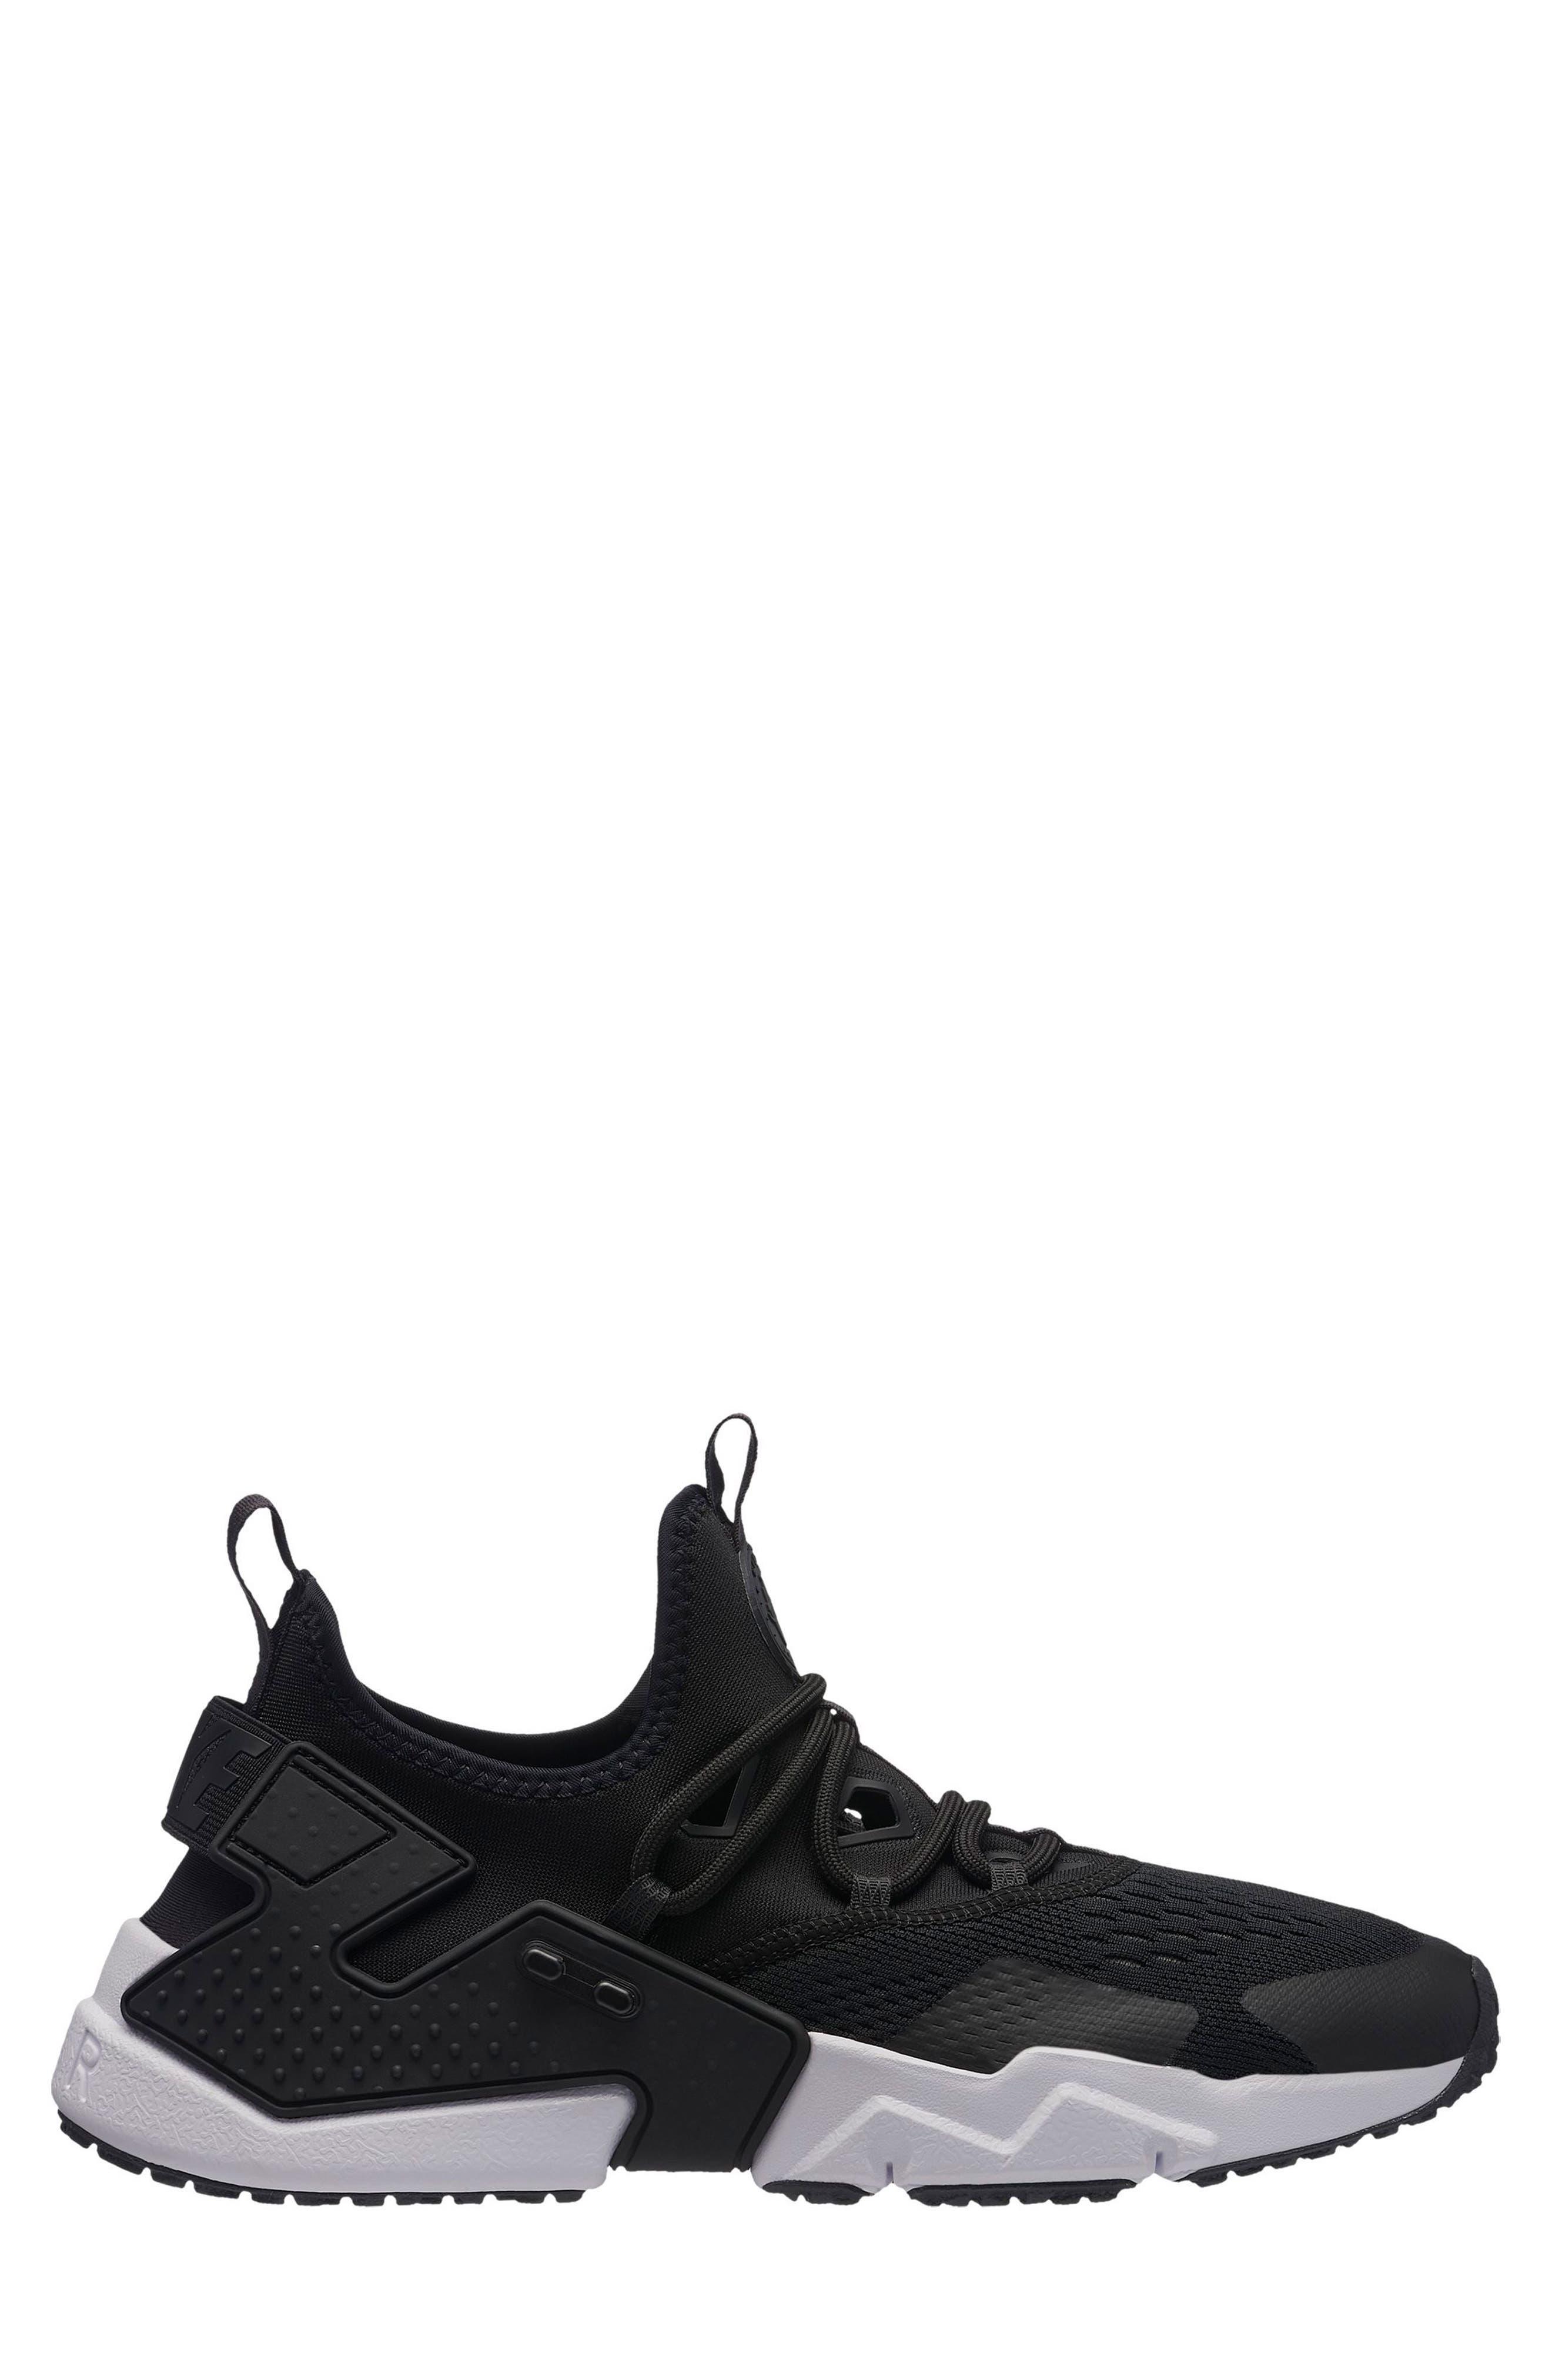 Air Huarache Drift BR Sneaker,                         Main,                         color, Black/ Anthracite/ White